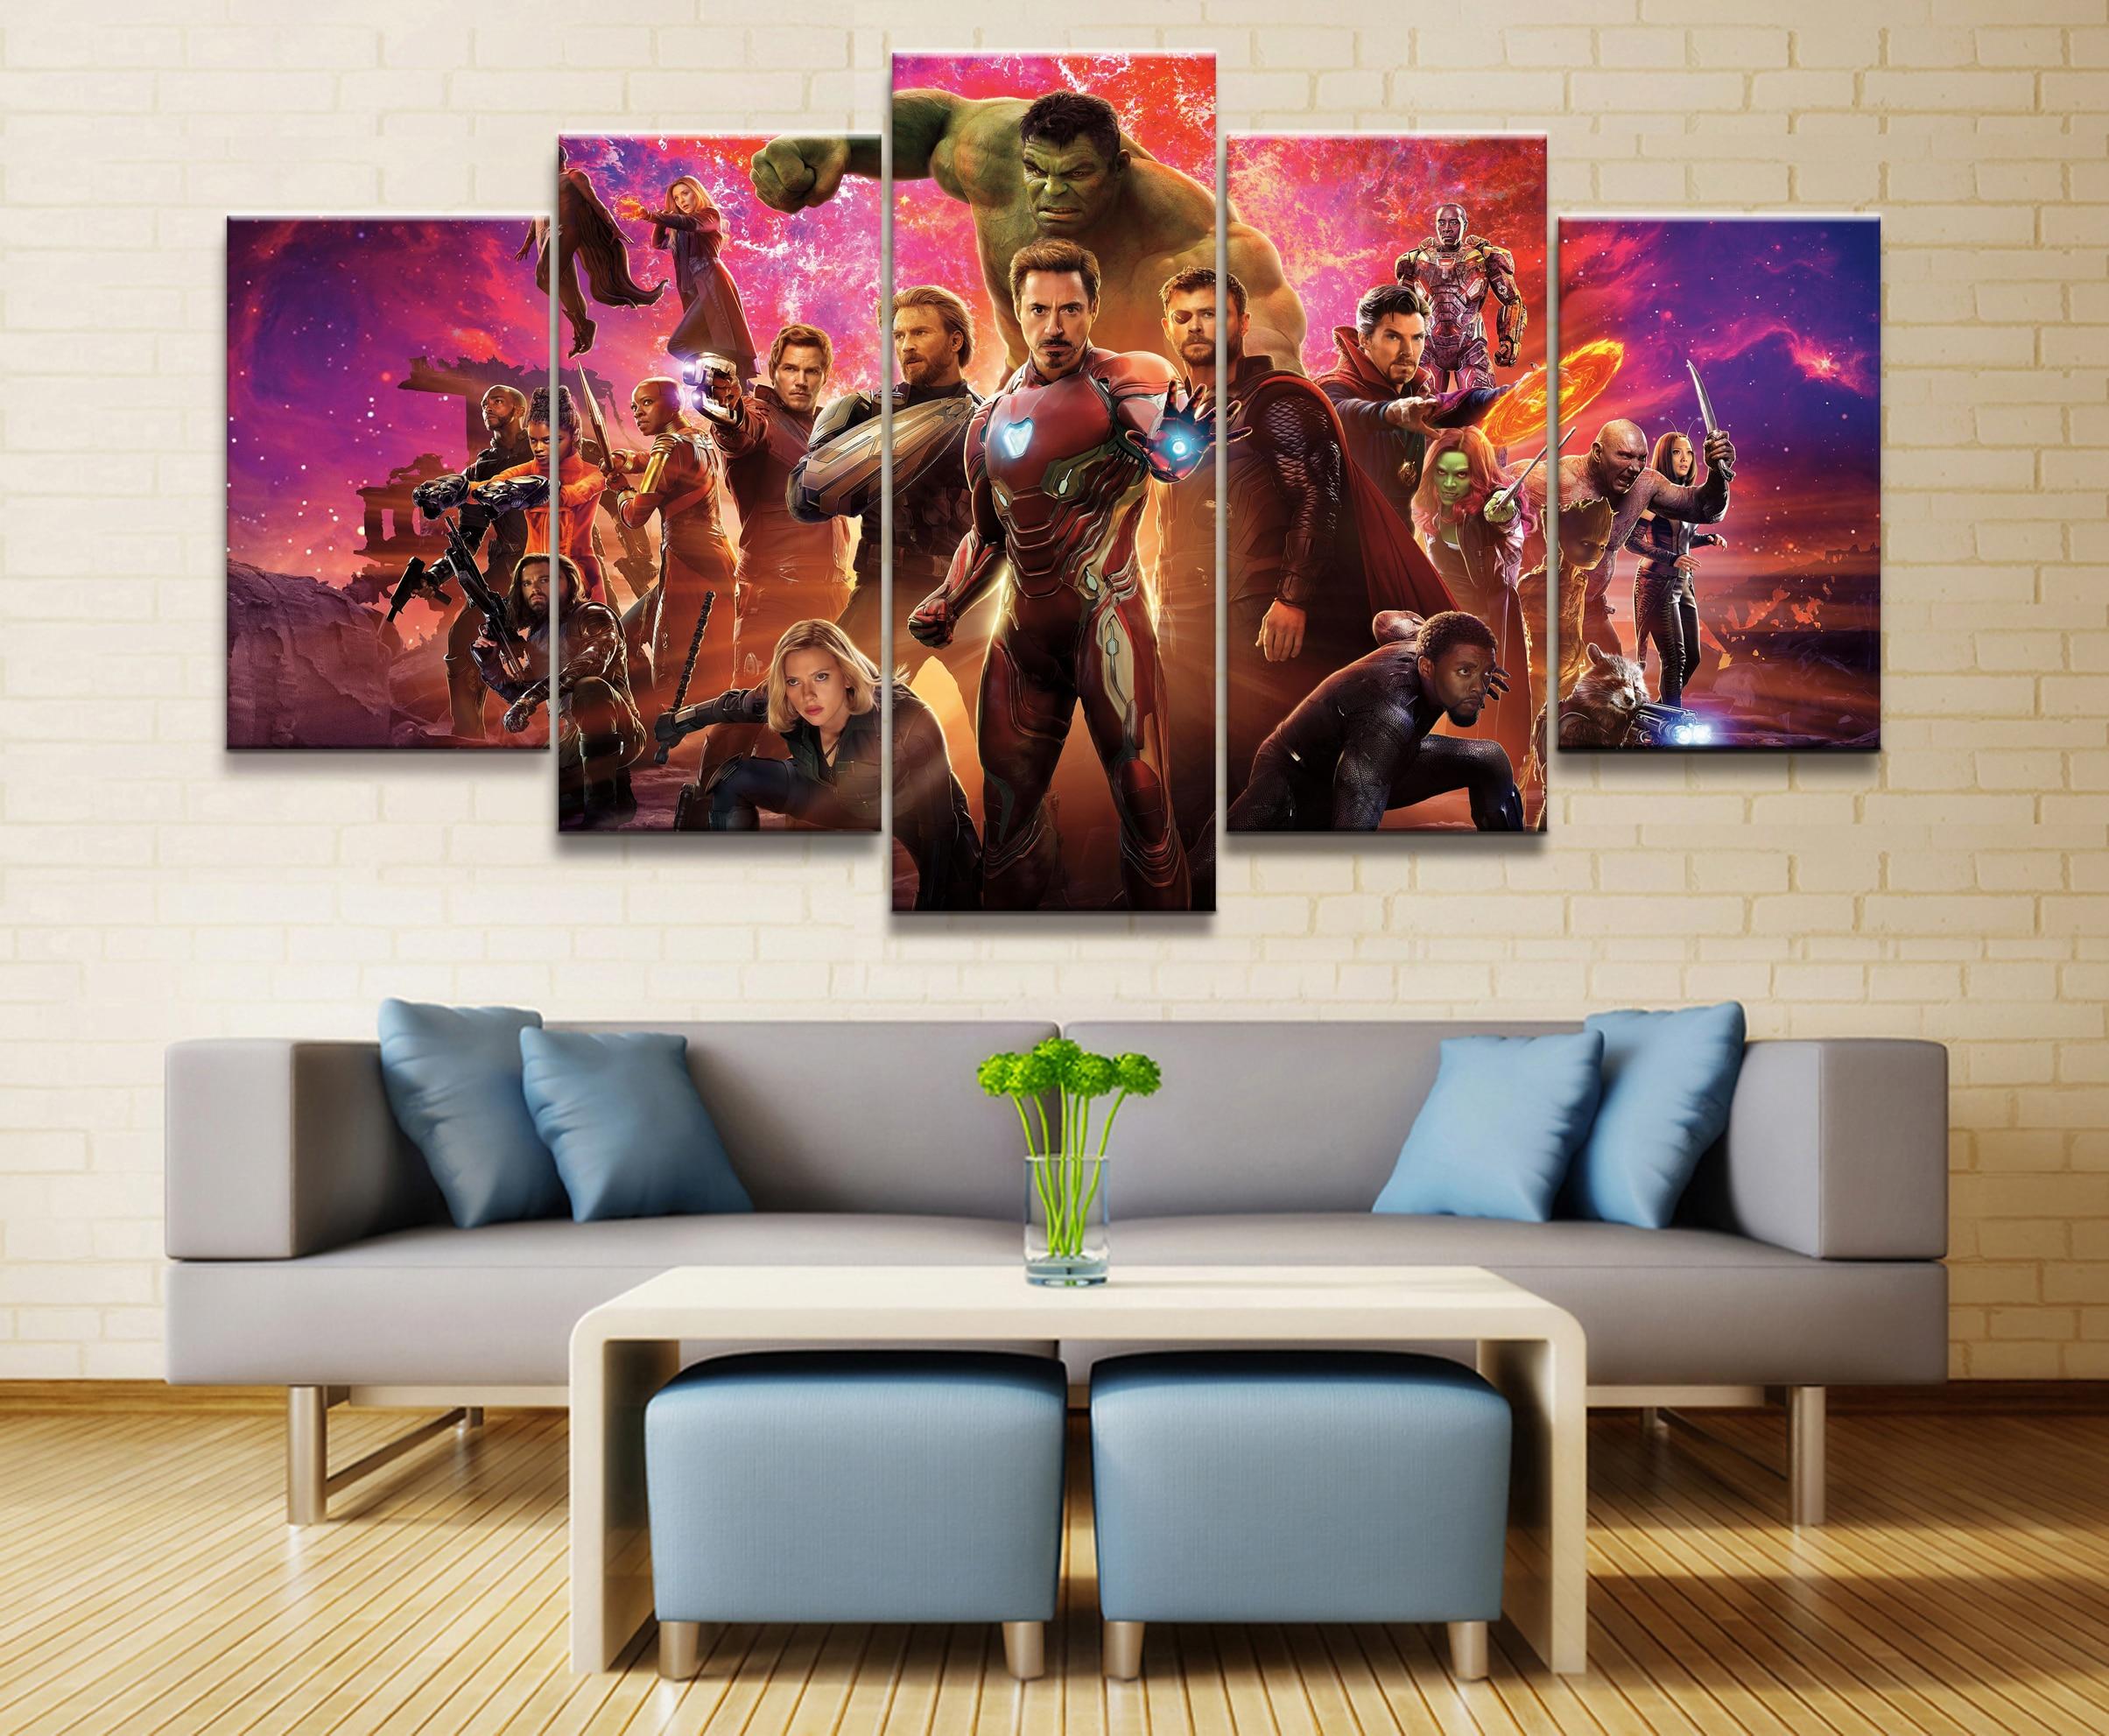 Venta caliente sin marco 5 paneles imagen Marvel Avengers película lienzo impresión pintura arte pared arte lienzo pintura al por mayor